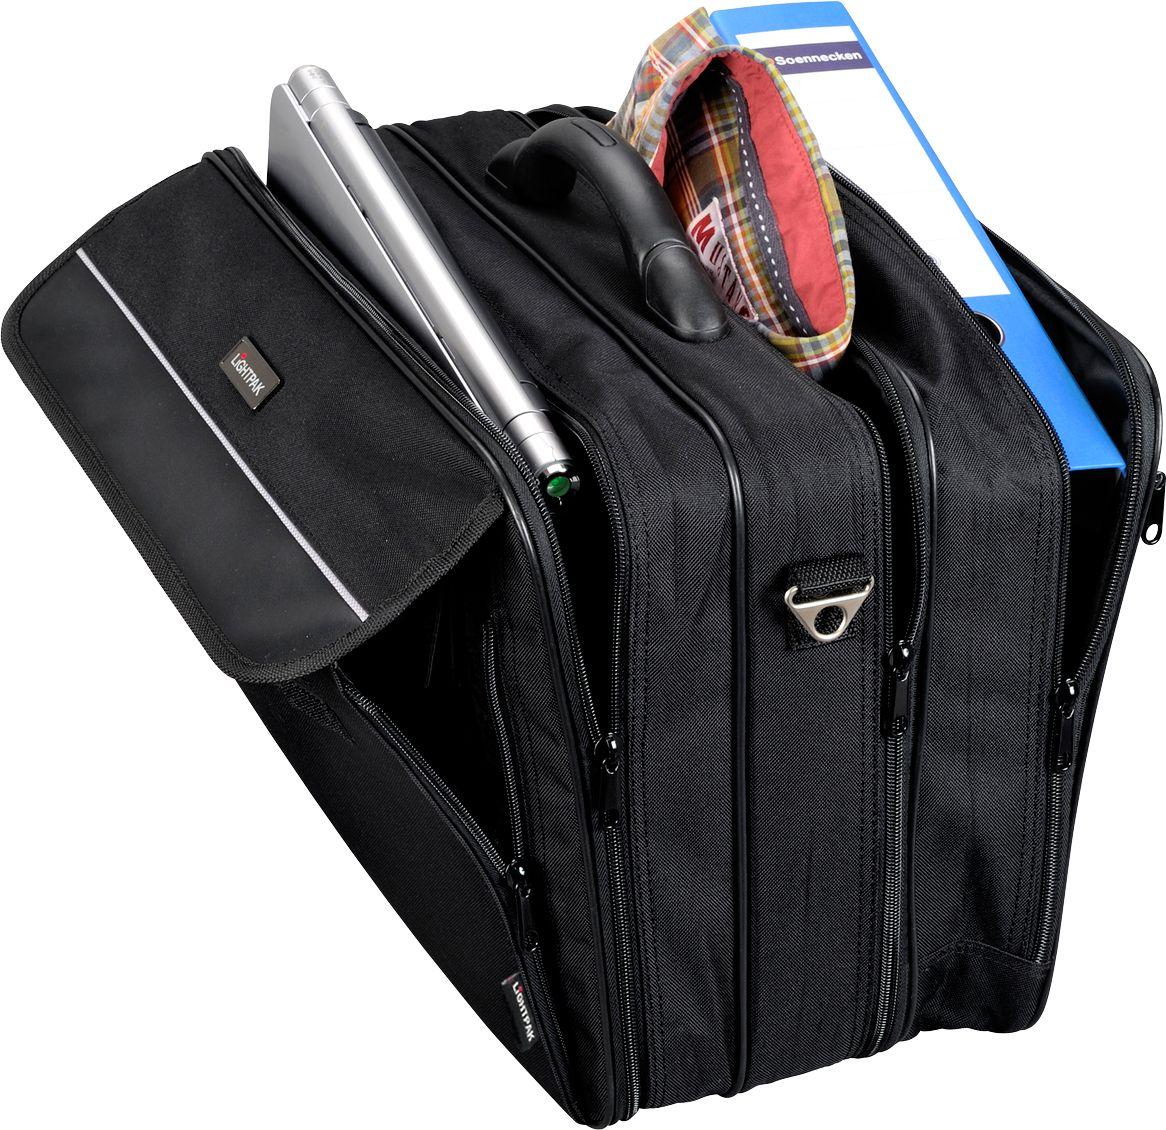 lightpak notebook tasche corniche f 17 zoll laptops 3. Black Bedroom Furniture Sets. Home Design Ideas